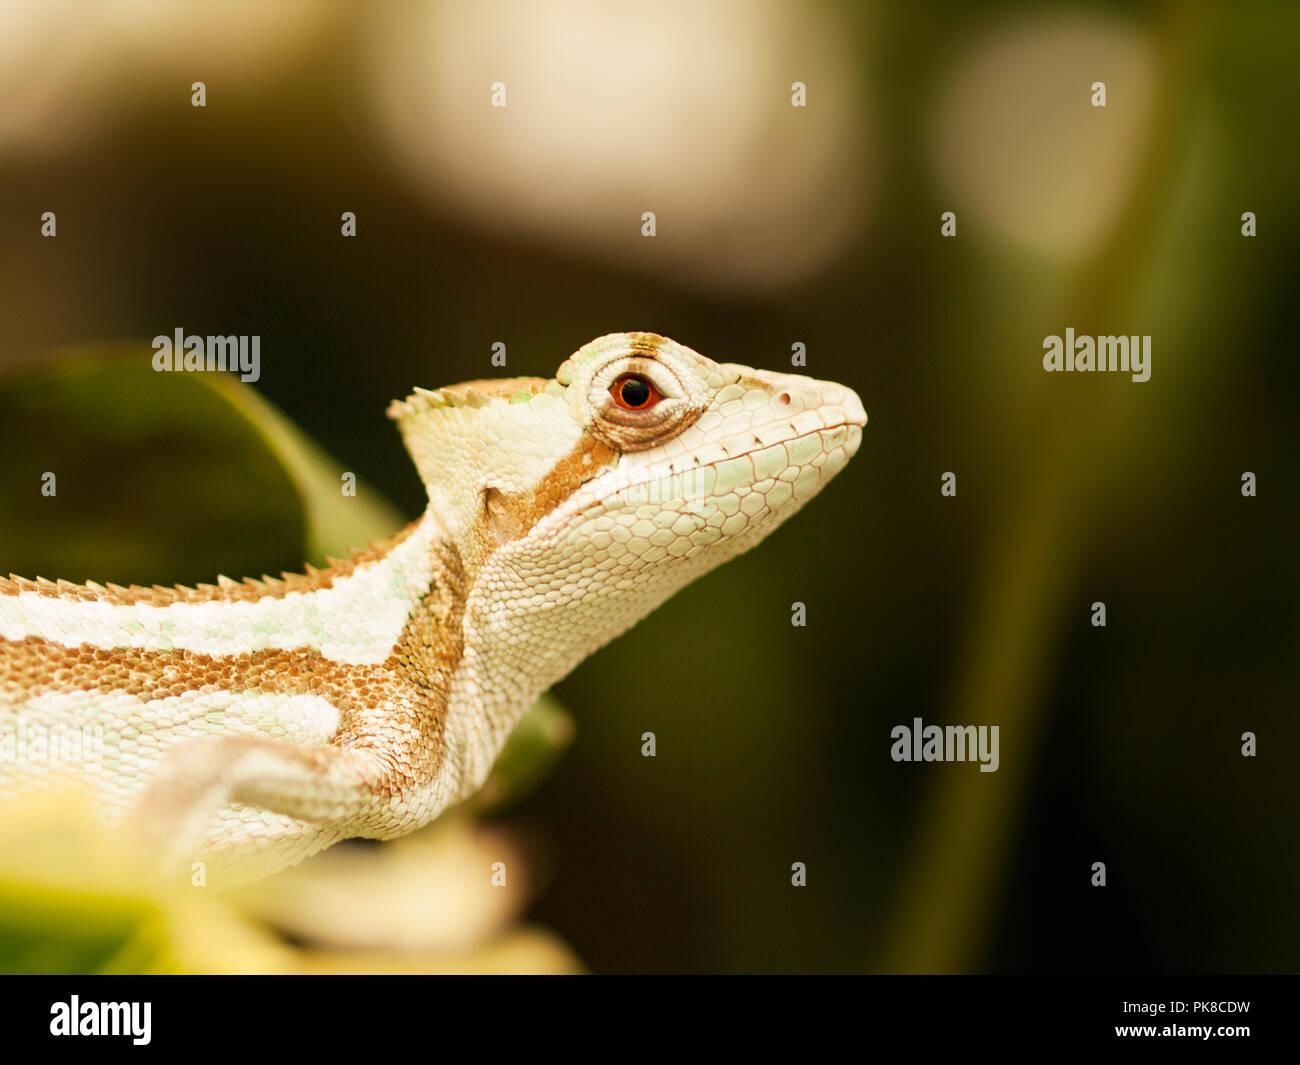 Portrait of Jesus Iguana lizard - Laemanctus serratus Stock Photo